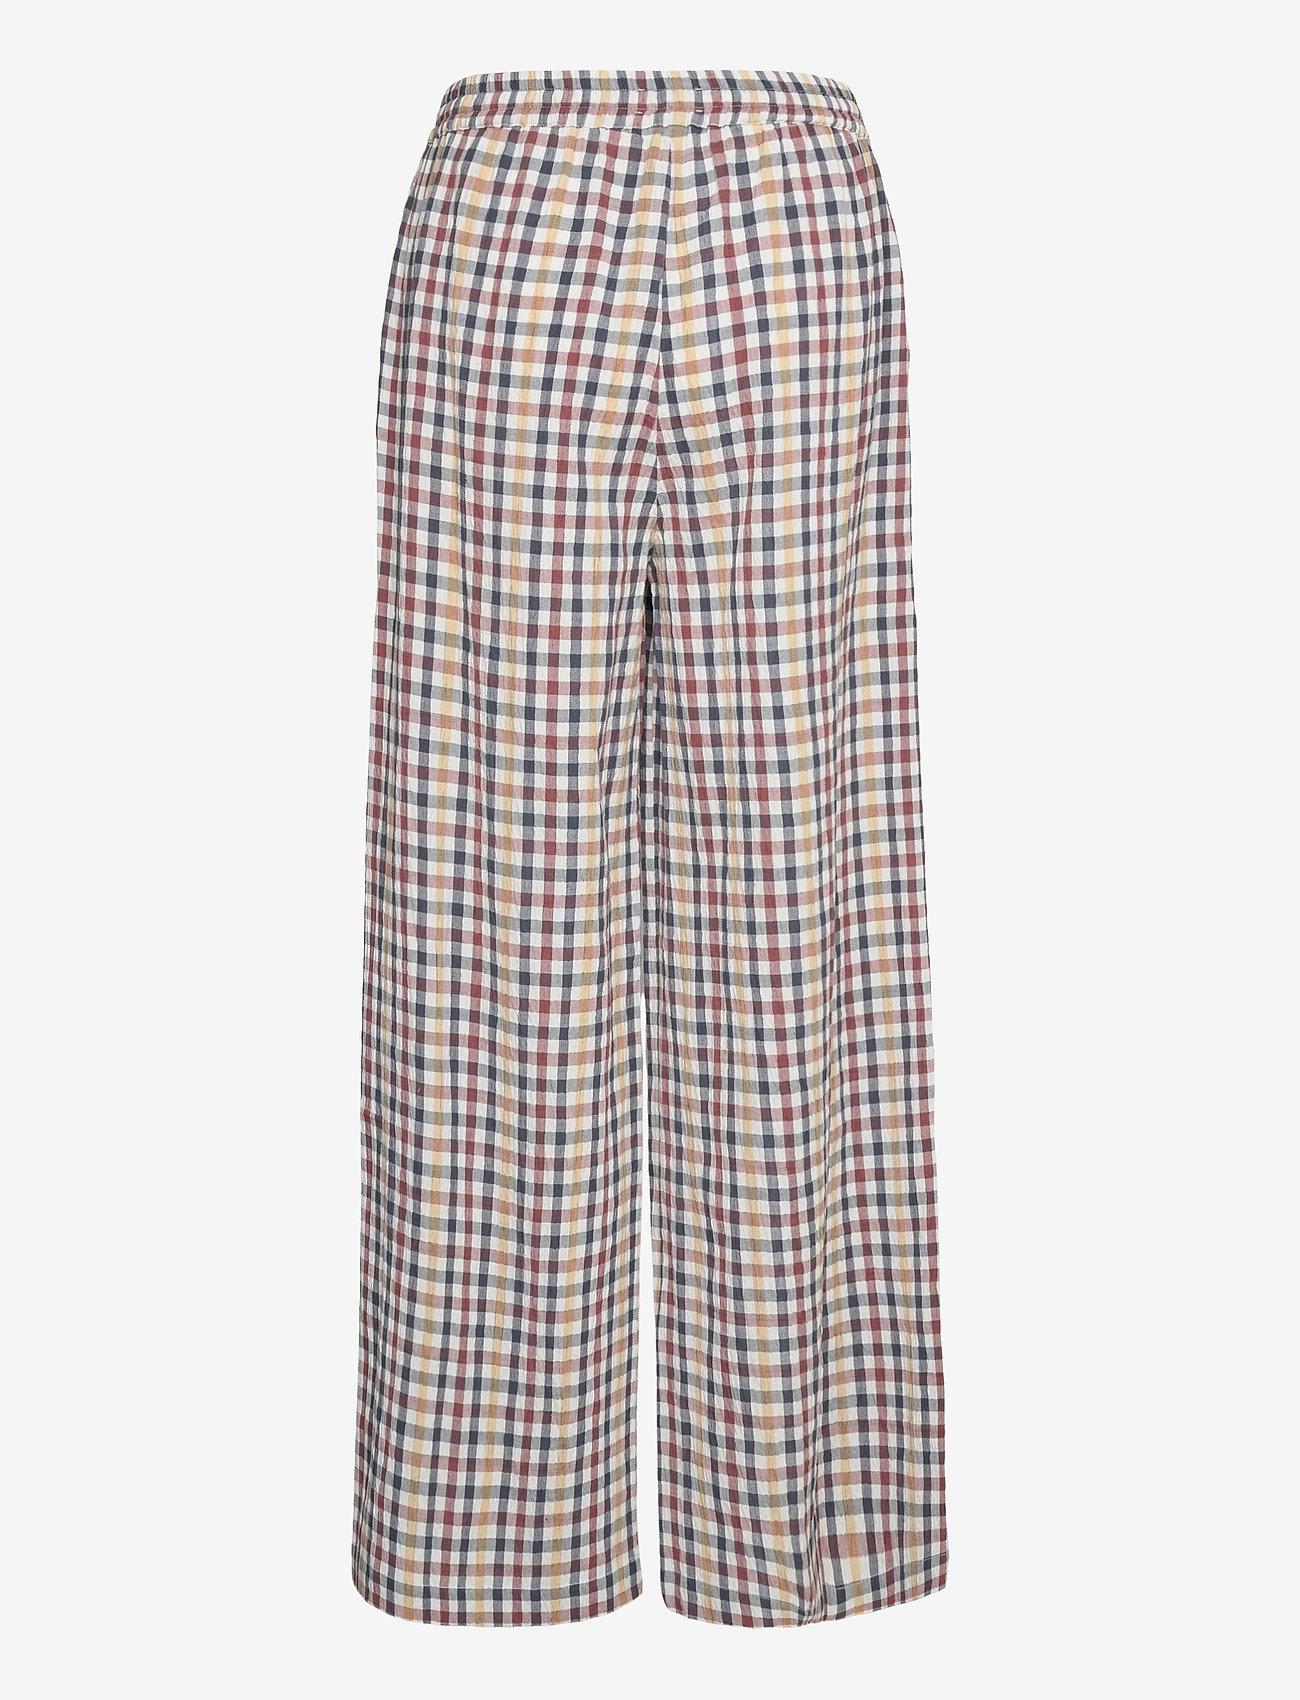 Lollys Laundry - Liam Pants - bukser med brede ben - check print - 1